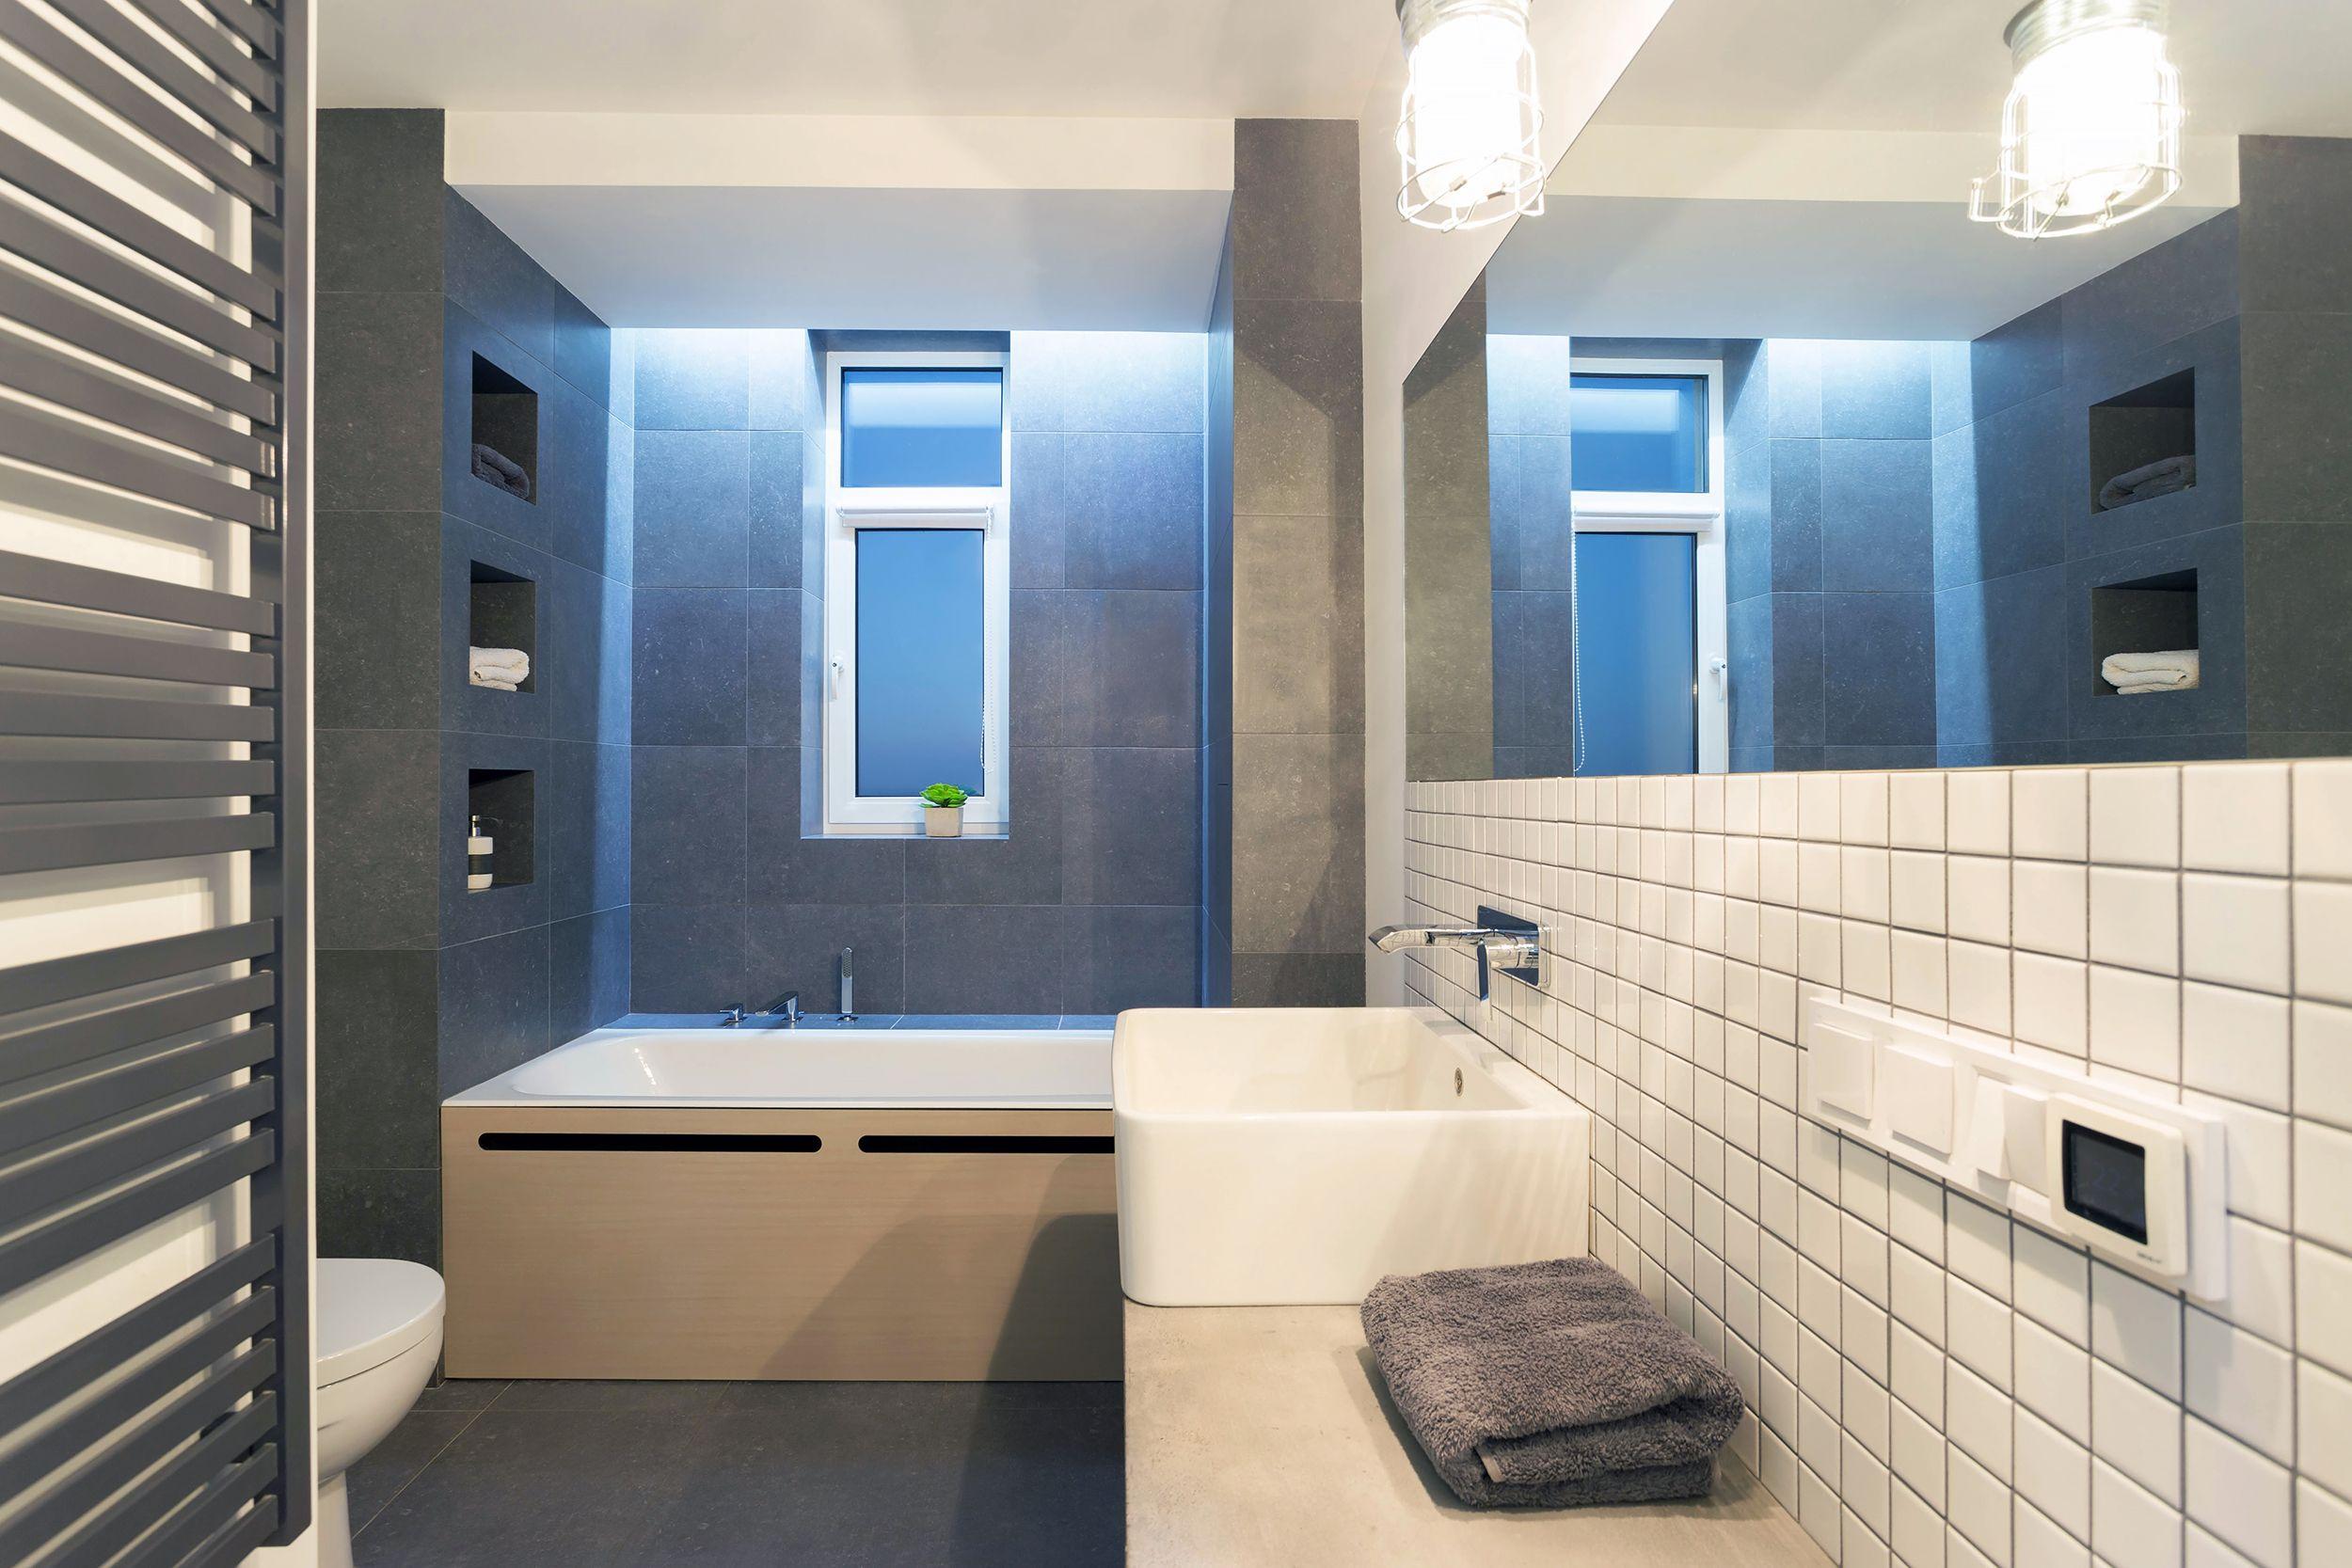 Architects Bathroom Interior DesignSimple Bathroom DesignsBathroom